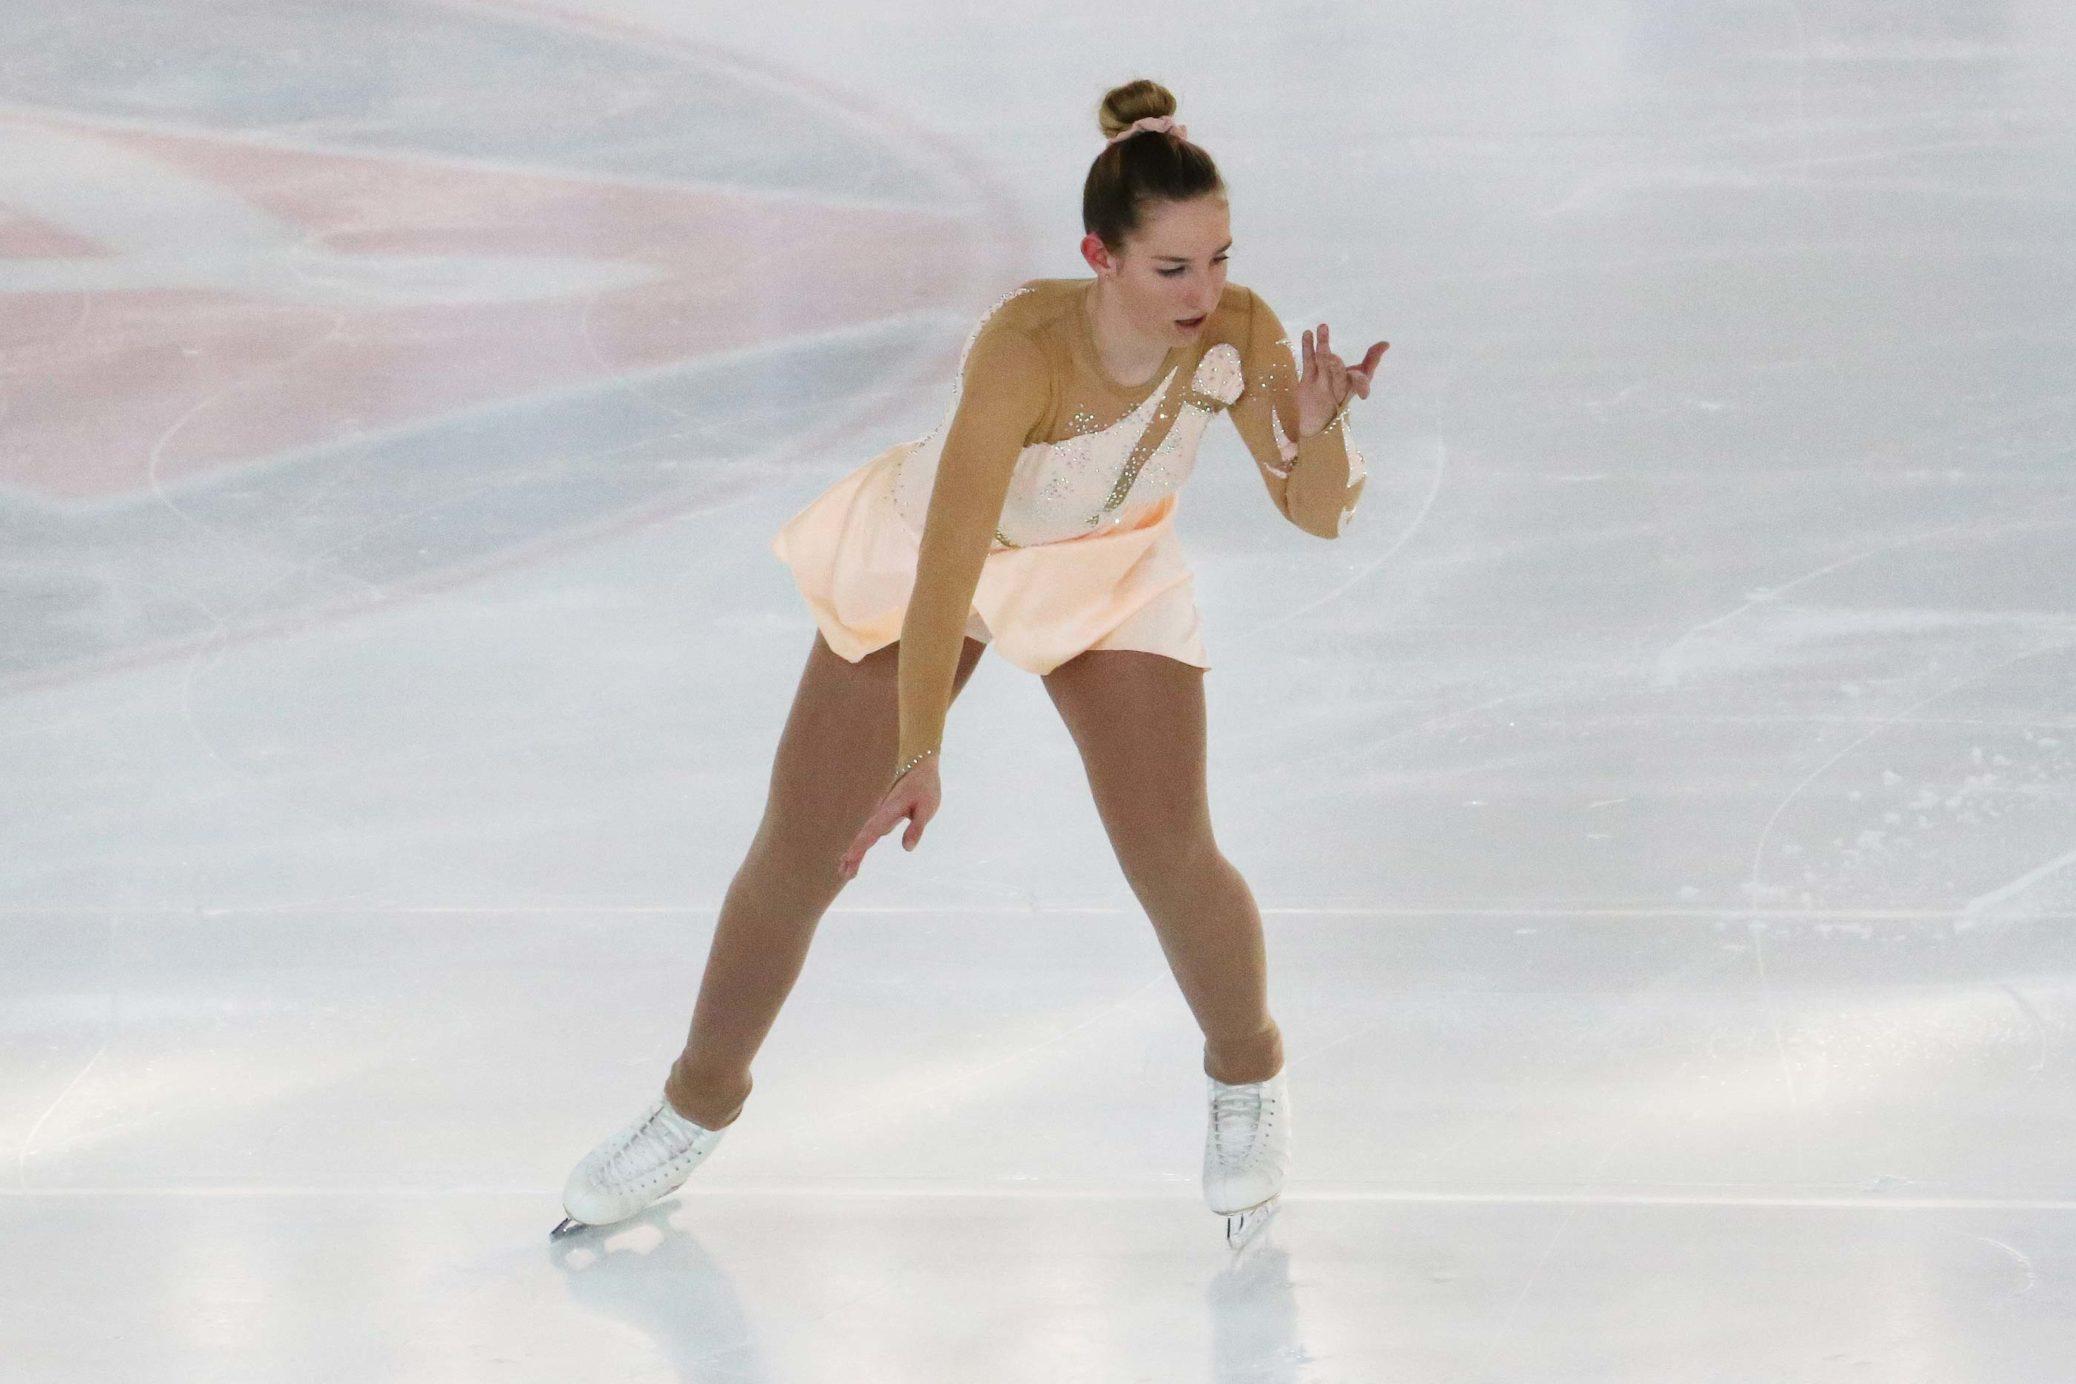 Nadine Boselli, Rang 2, Klasse 4 Damen. Foto: Tanja Schrepfer Knecht